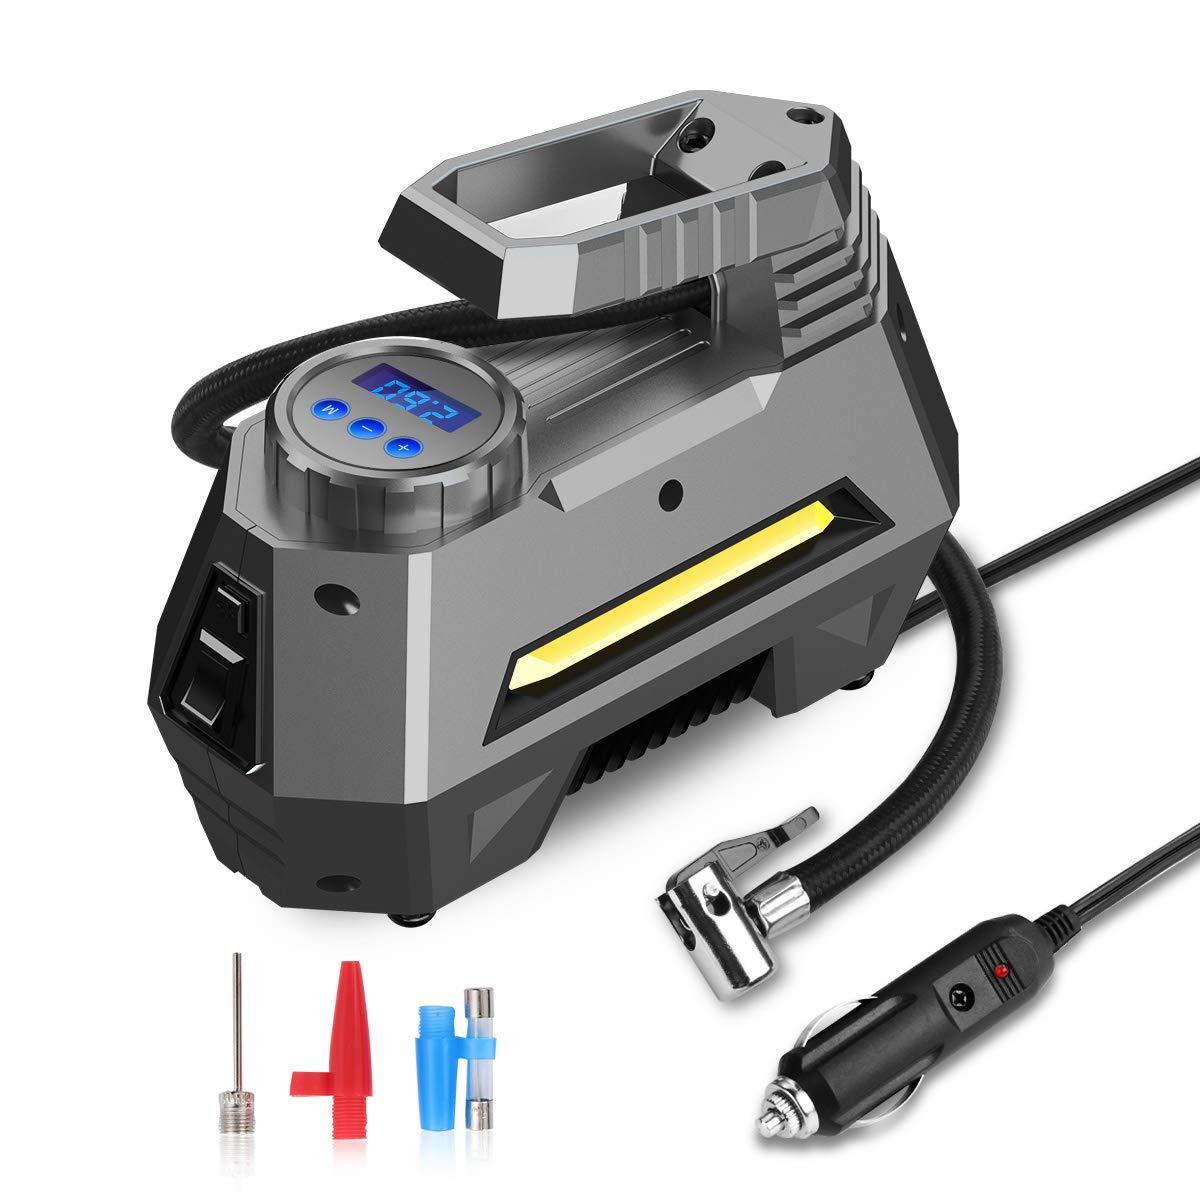 JOYROOM Portable Air Compressor Tire Inflator - Car Tire Pump with Digital Pressure Gauge (150 PSI 12V DC), Bright Emergency Flashlight - for Auto, Trucks, Bicycles, Balls by JOYROOM (Image #7)